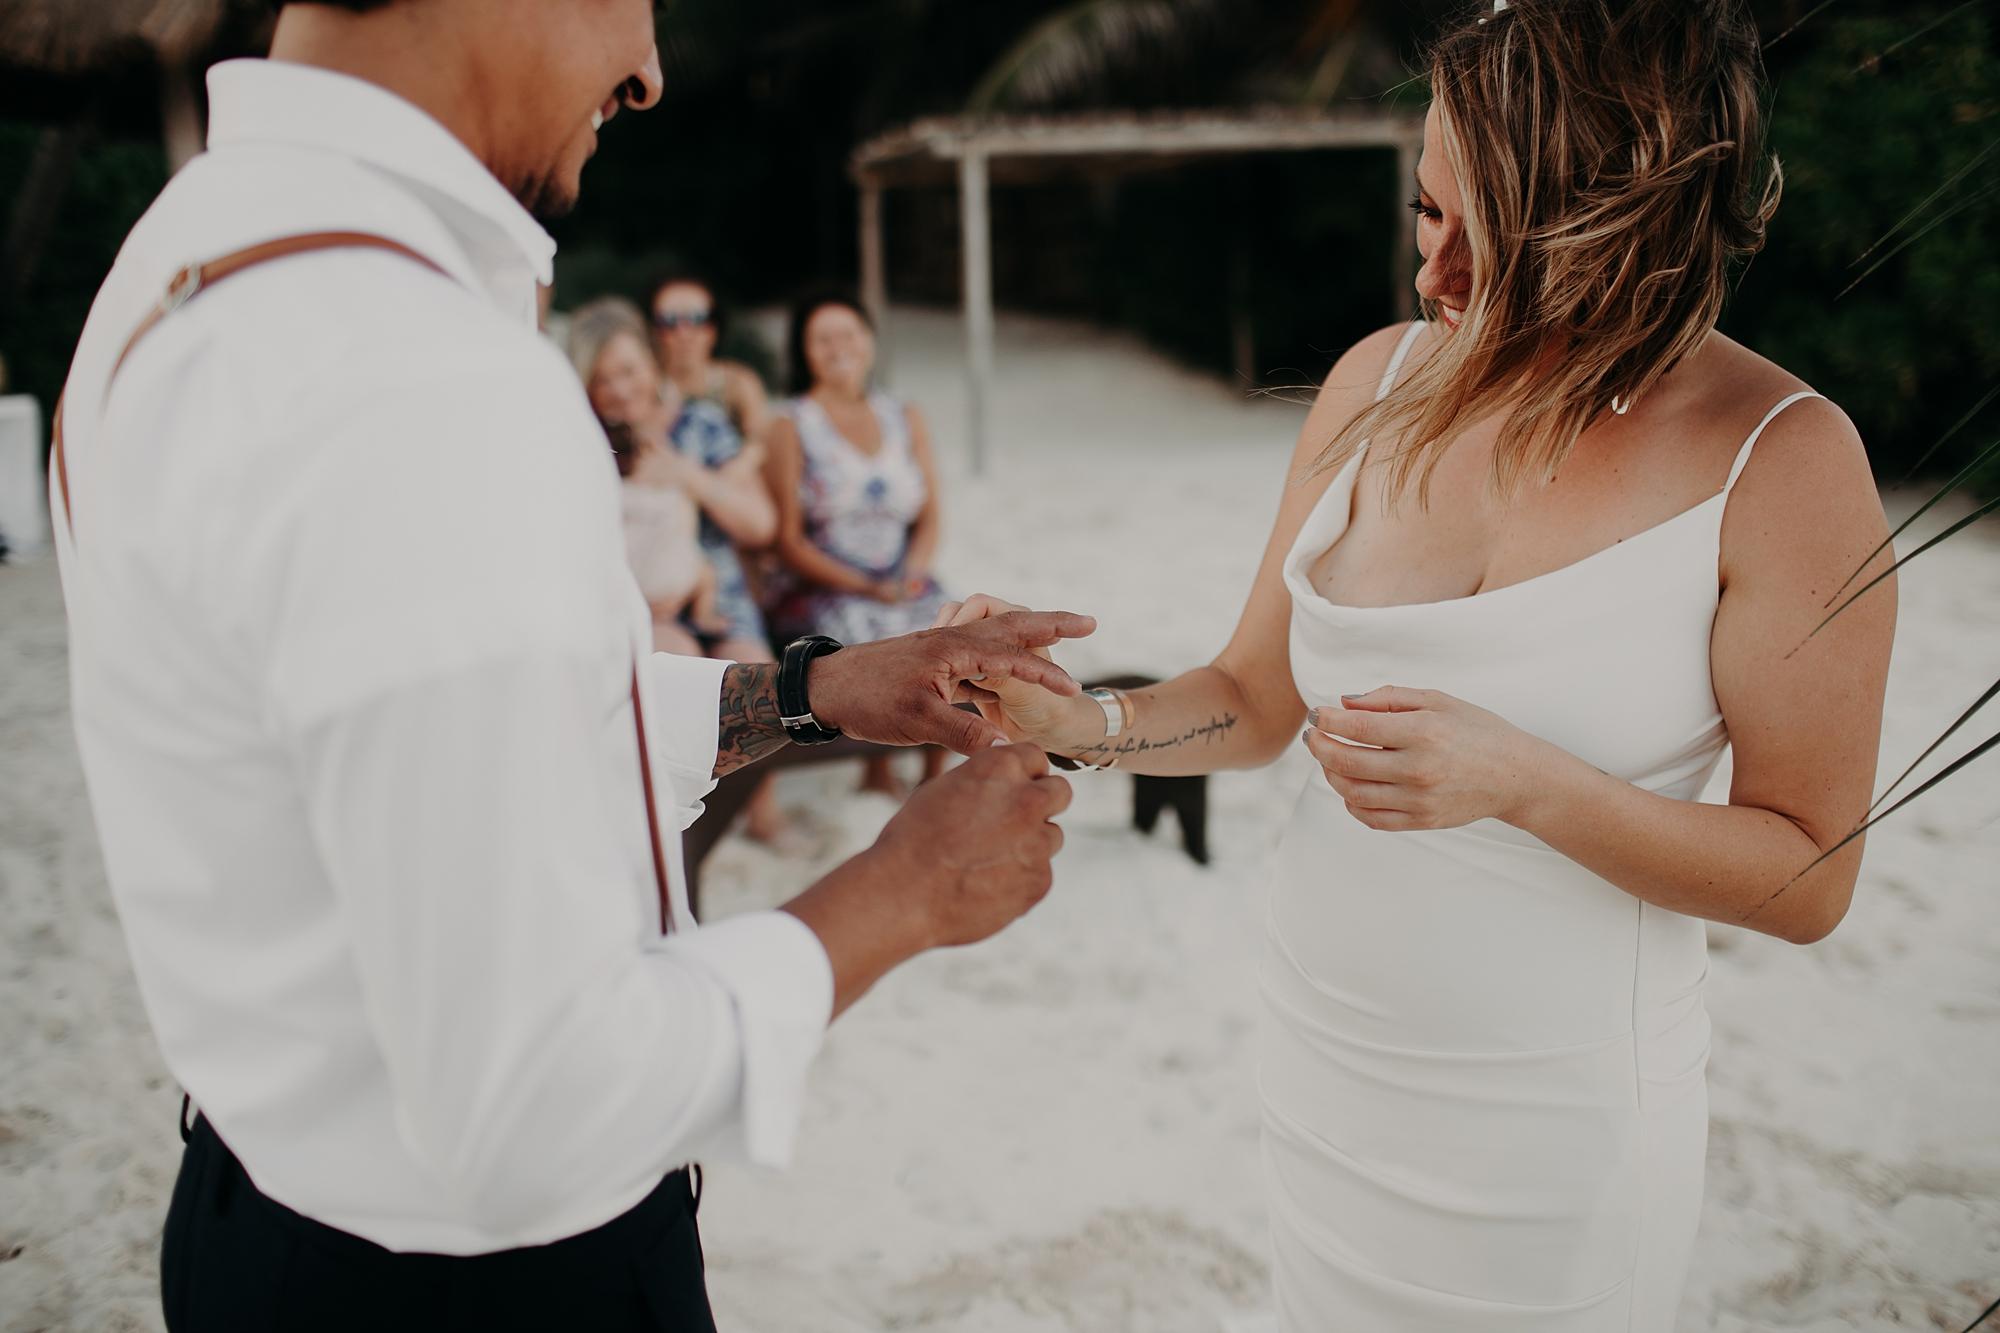 Danielle-San-Antonio-Wedding-Photographer-173_WEB.jpg